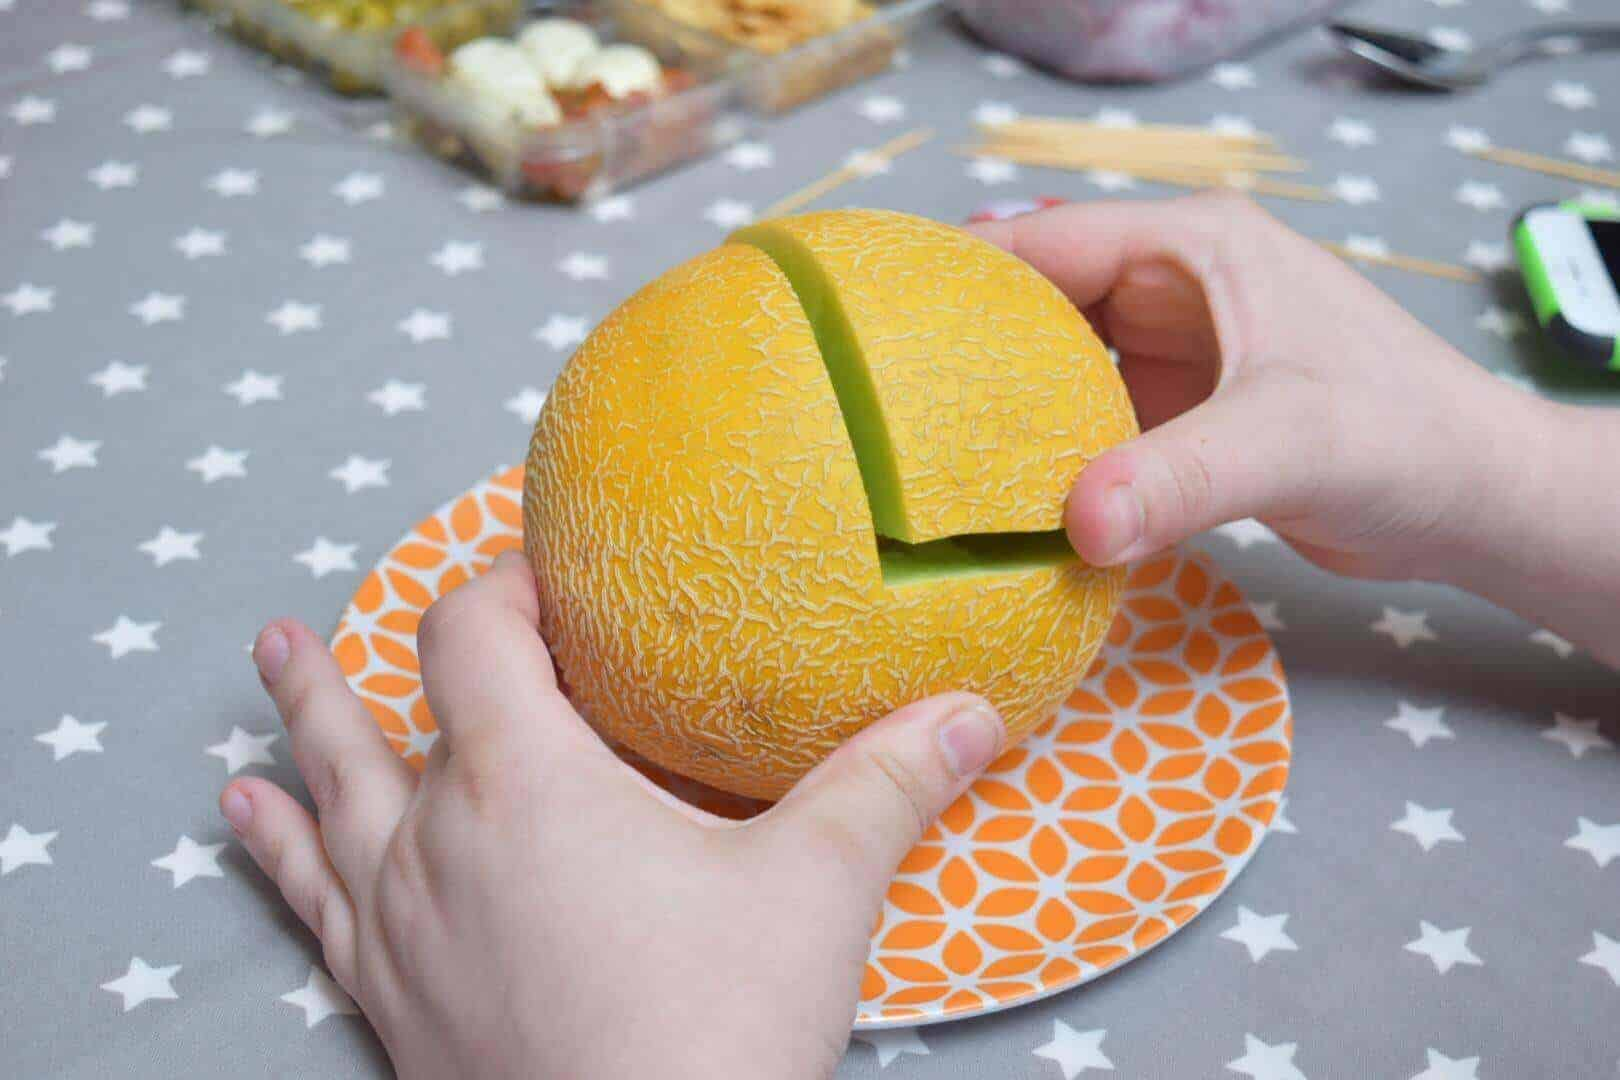 Carving Melon